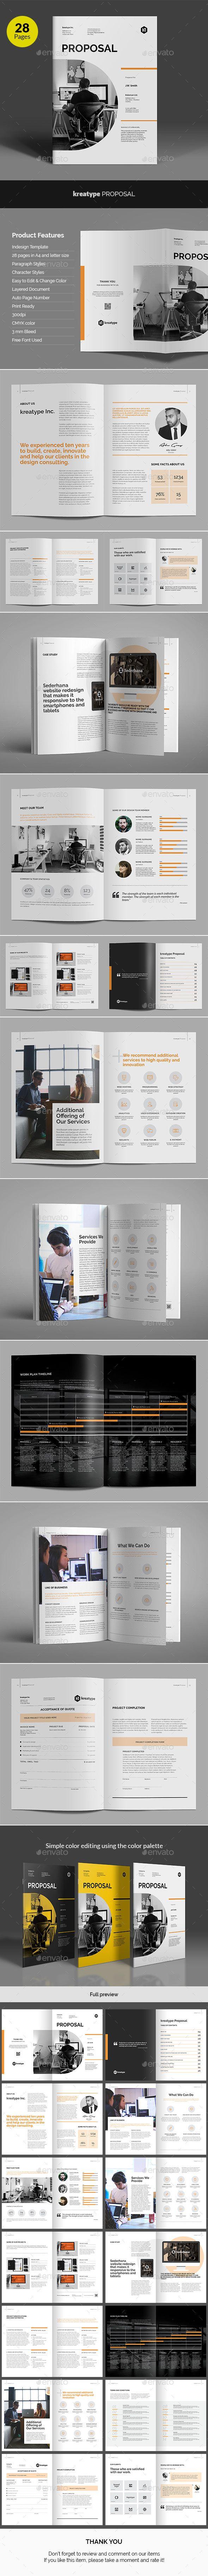 Kreatype Business Proposal v03 - Corporate Brochures. Download link: https://graphicriver.net/item/kreatype-business-proposal-v03/17263548?ref=heriwibowo